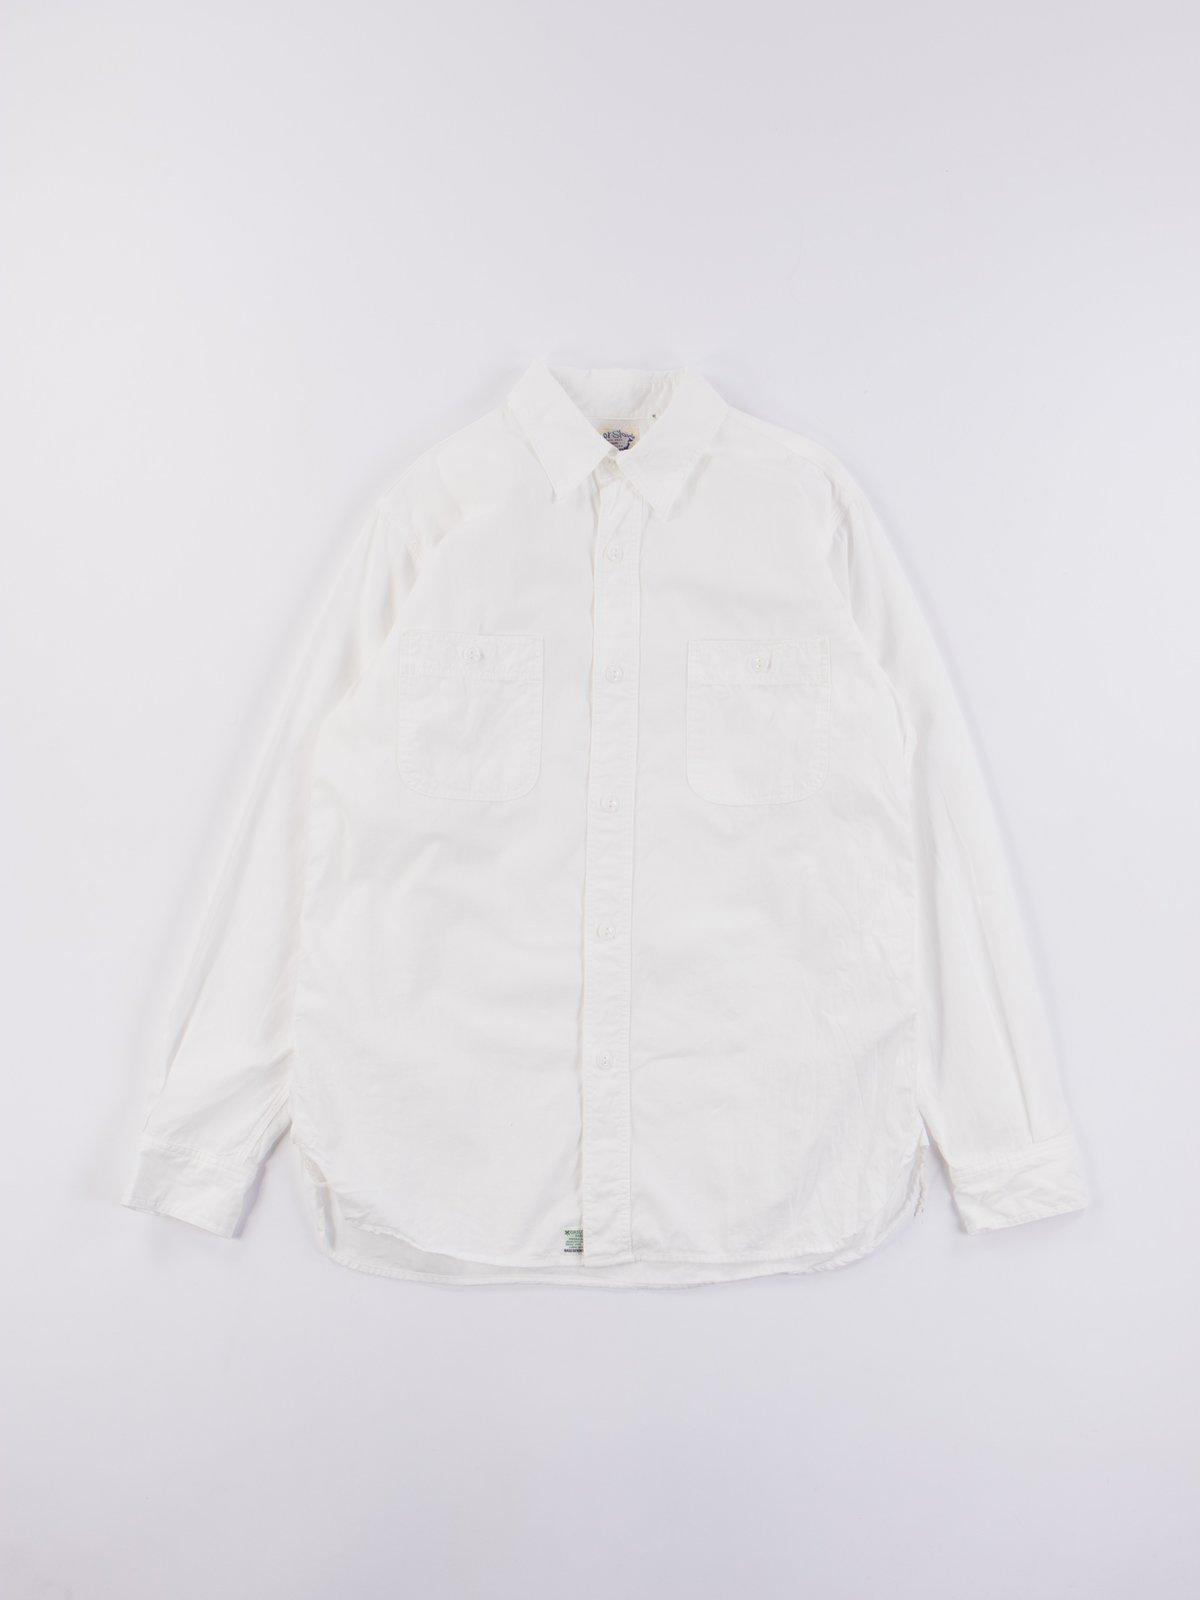 White Chambray Work Shirt - Image 1